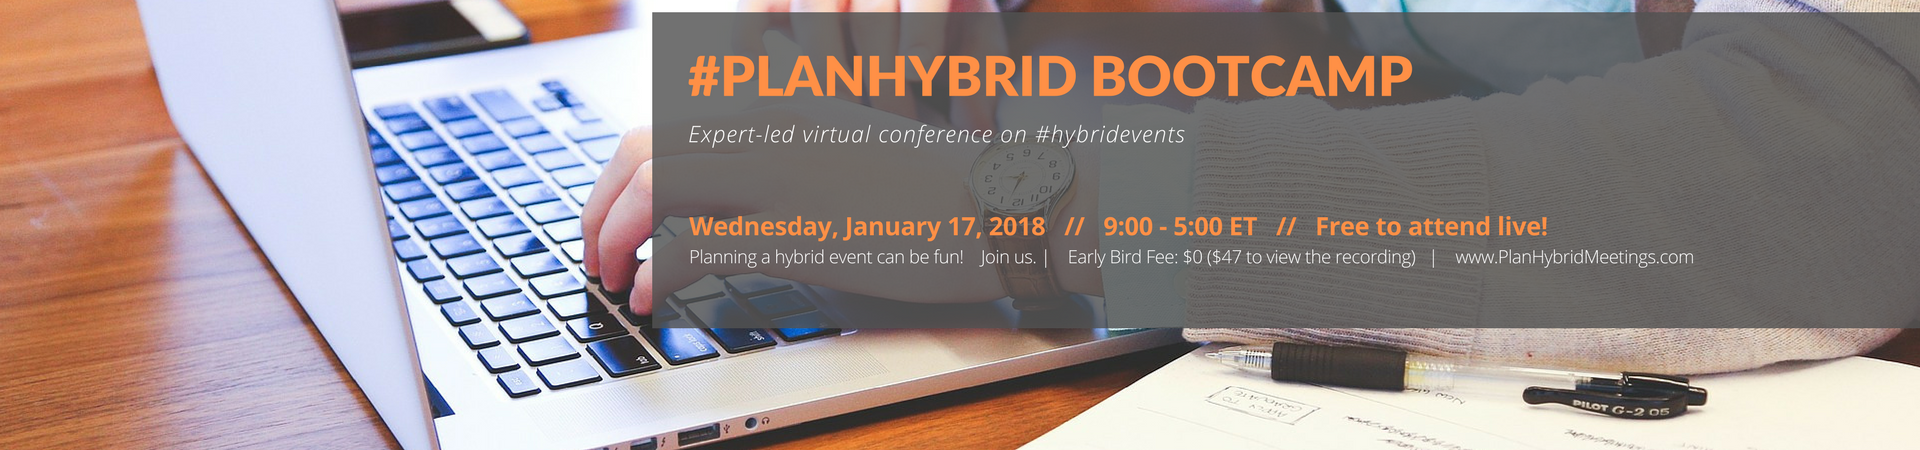 PlanHybrid Bootcamp 2018